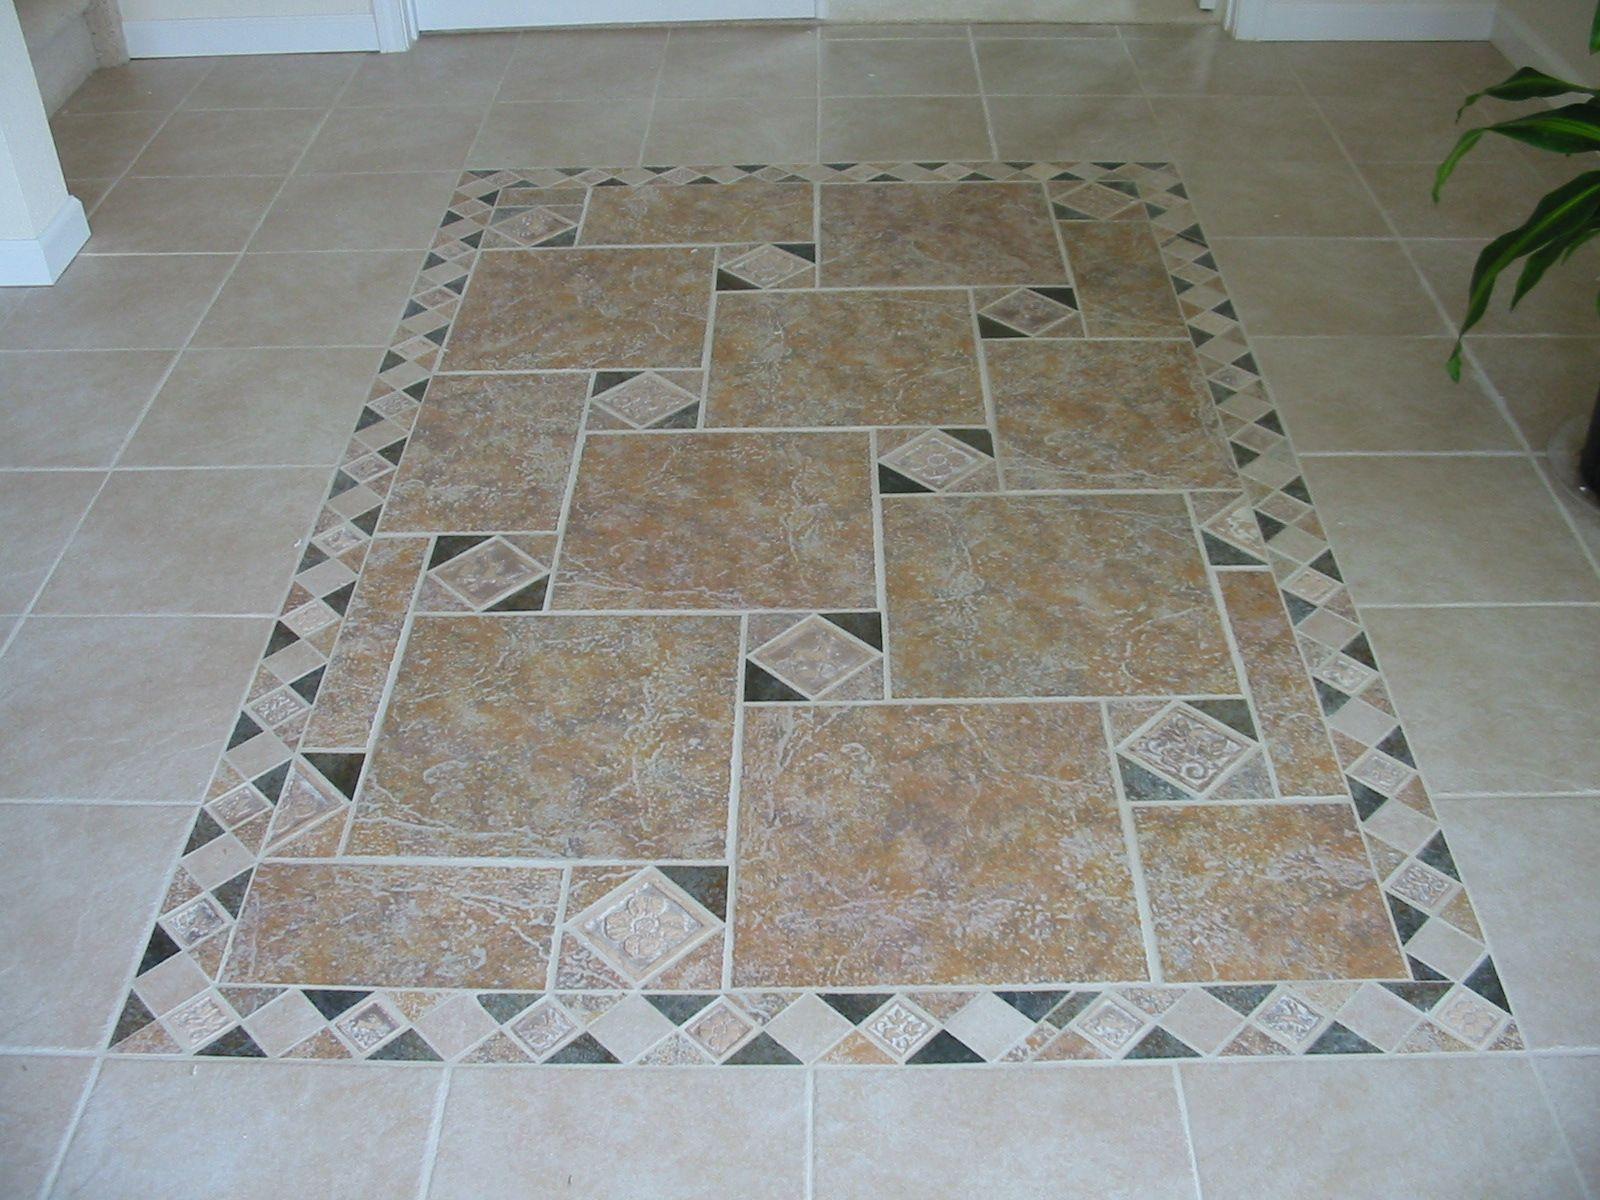 38 Fancy Basement Tile Floor Ideas Sketch Patterned Floor Tiles